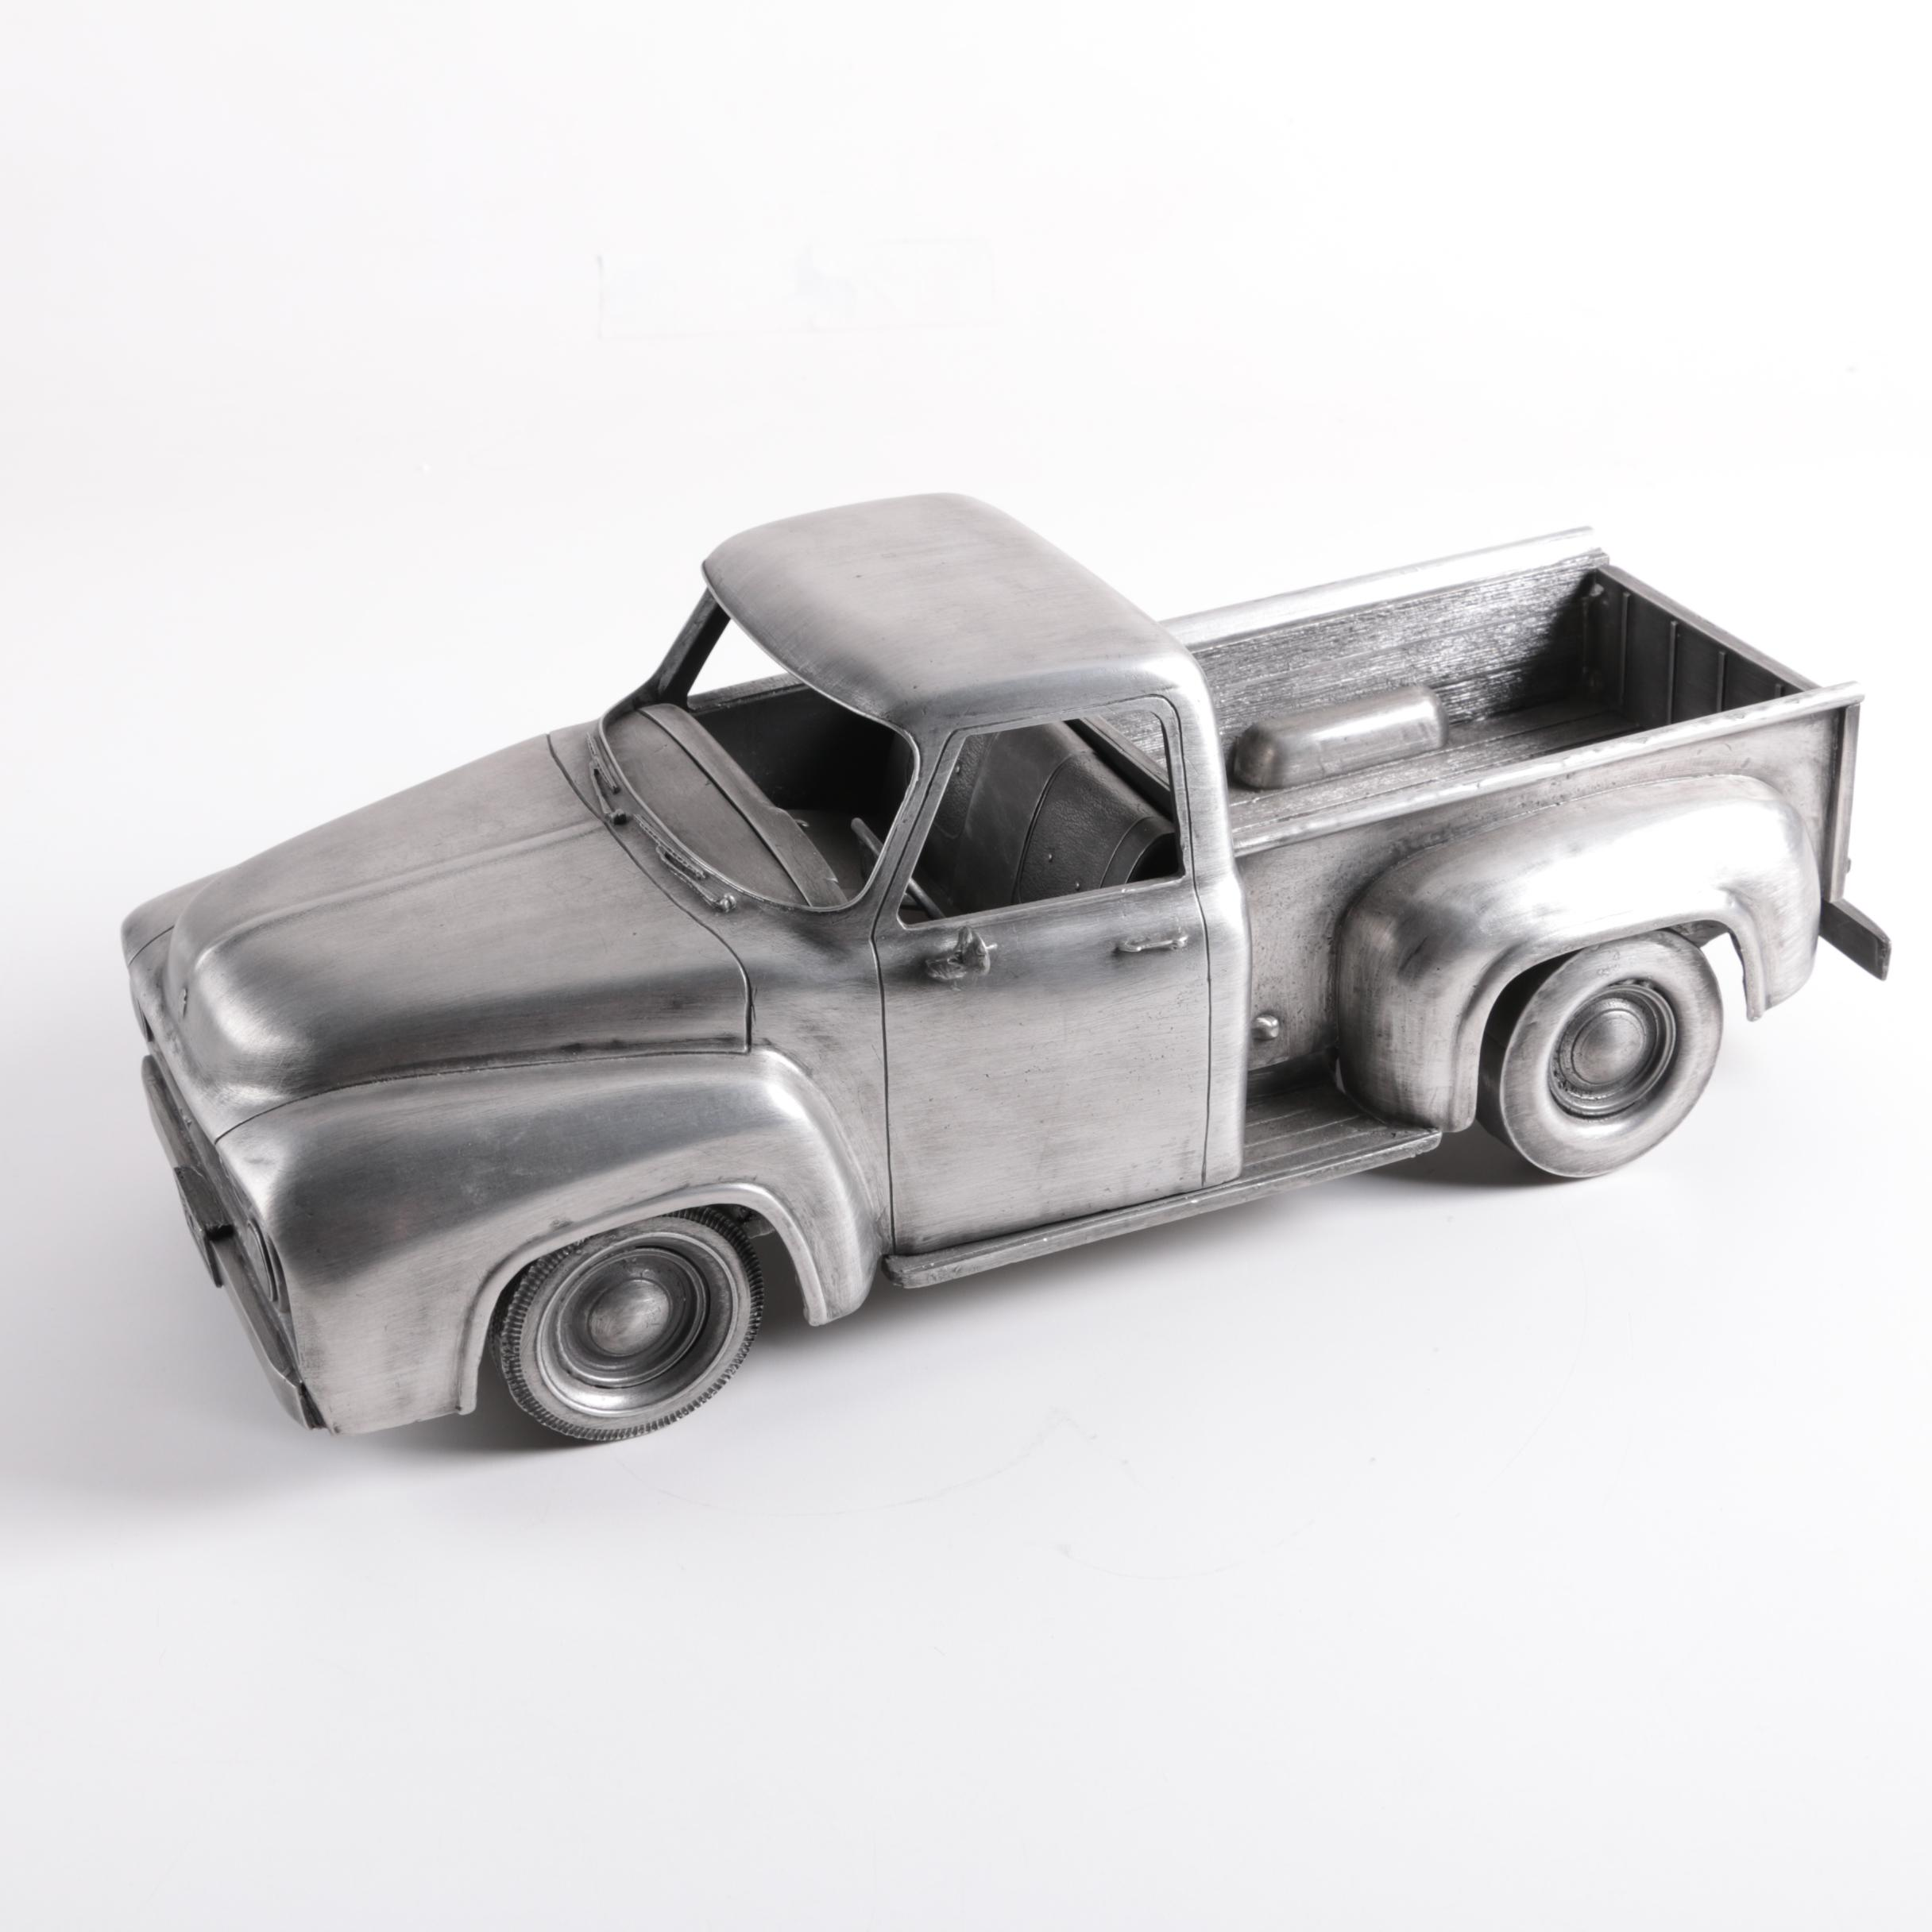 Pewter Pickup Truck Figurine